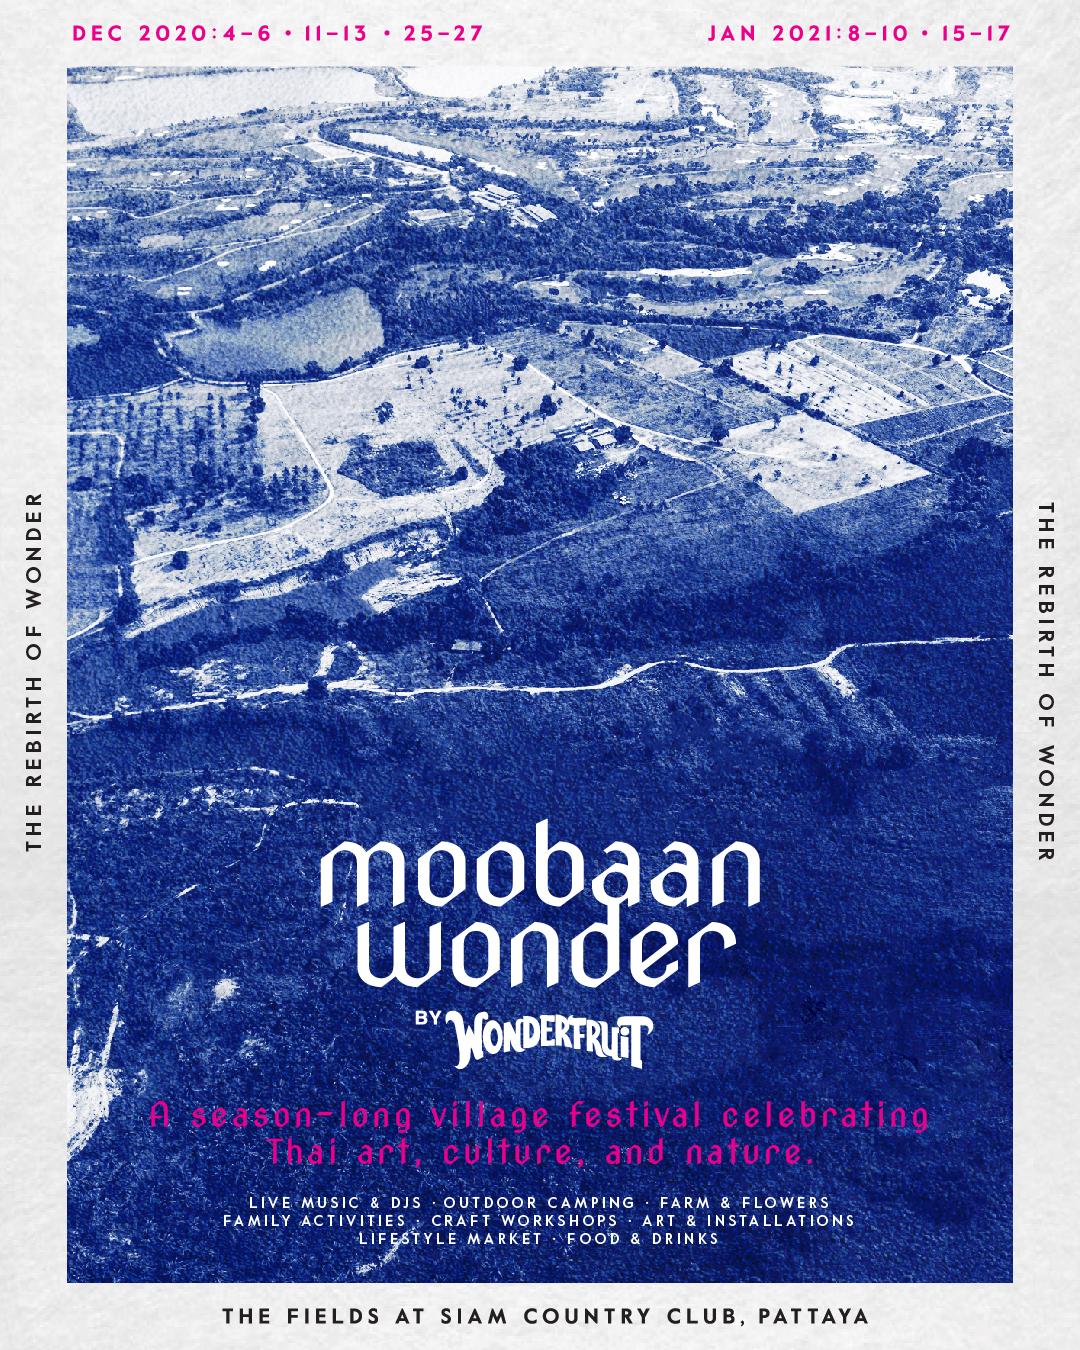 MW_TM_main-poster-002-EN-2.jpg